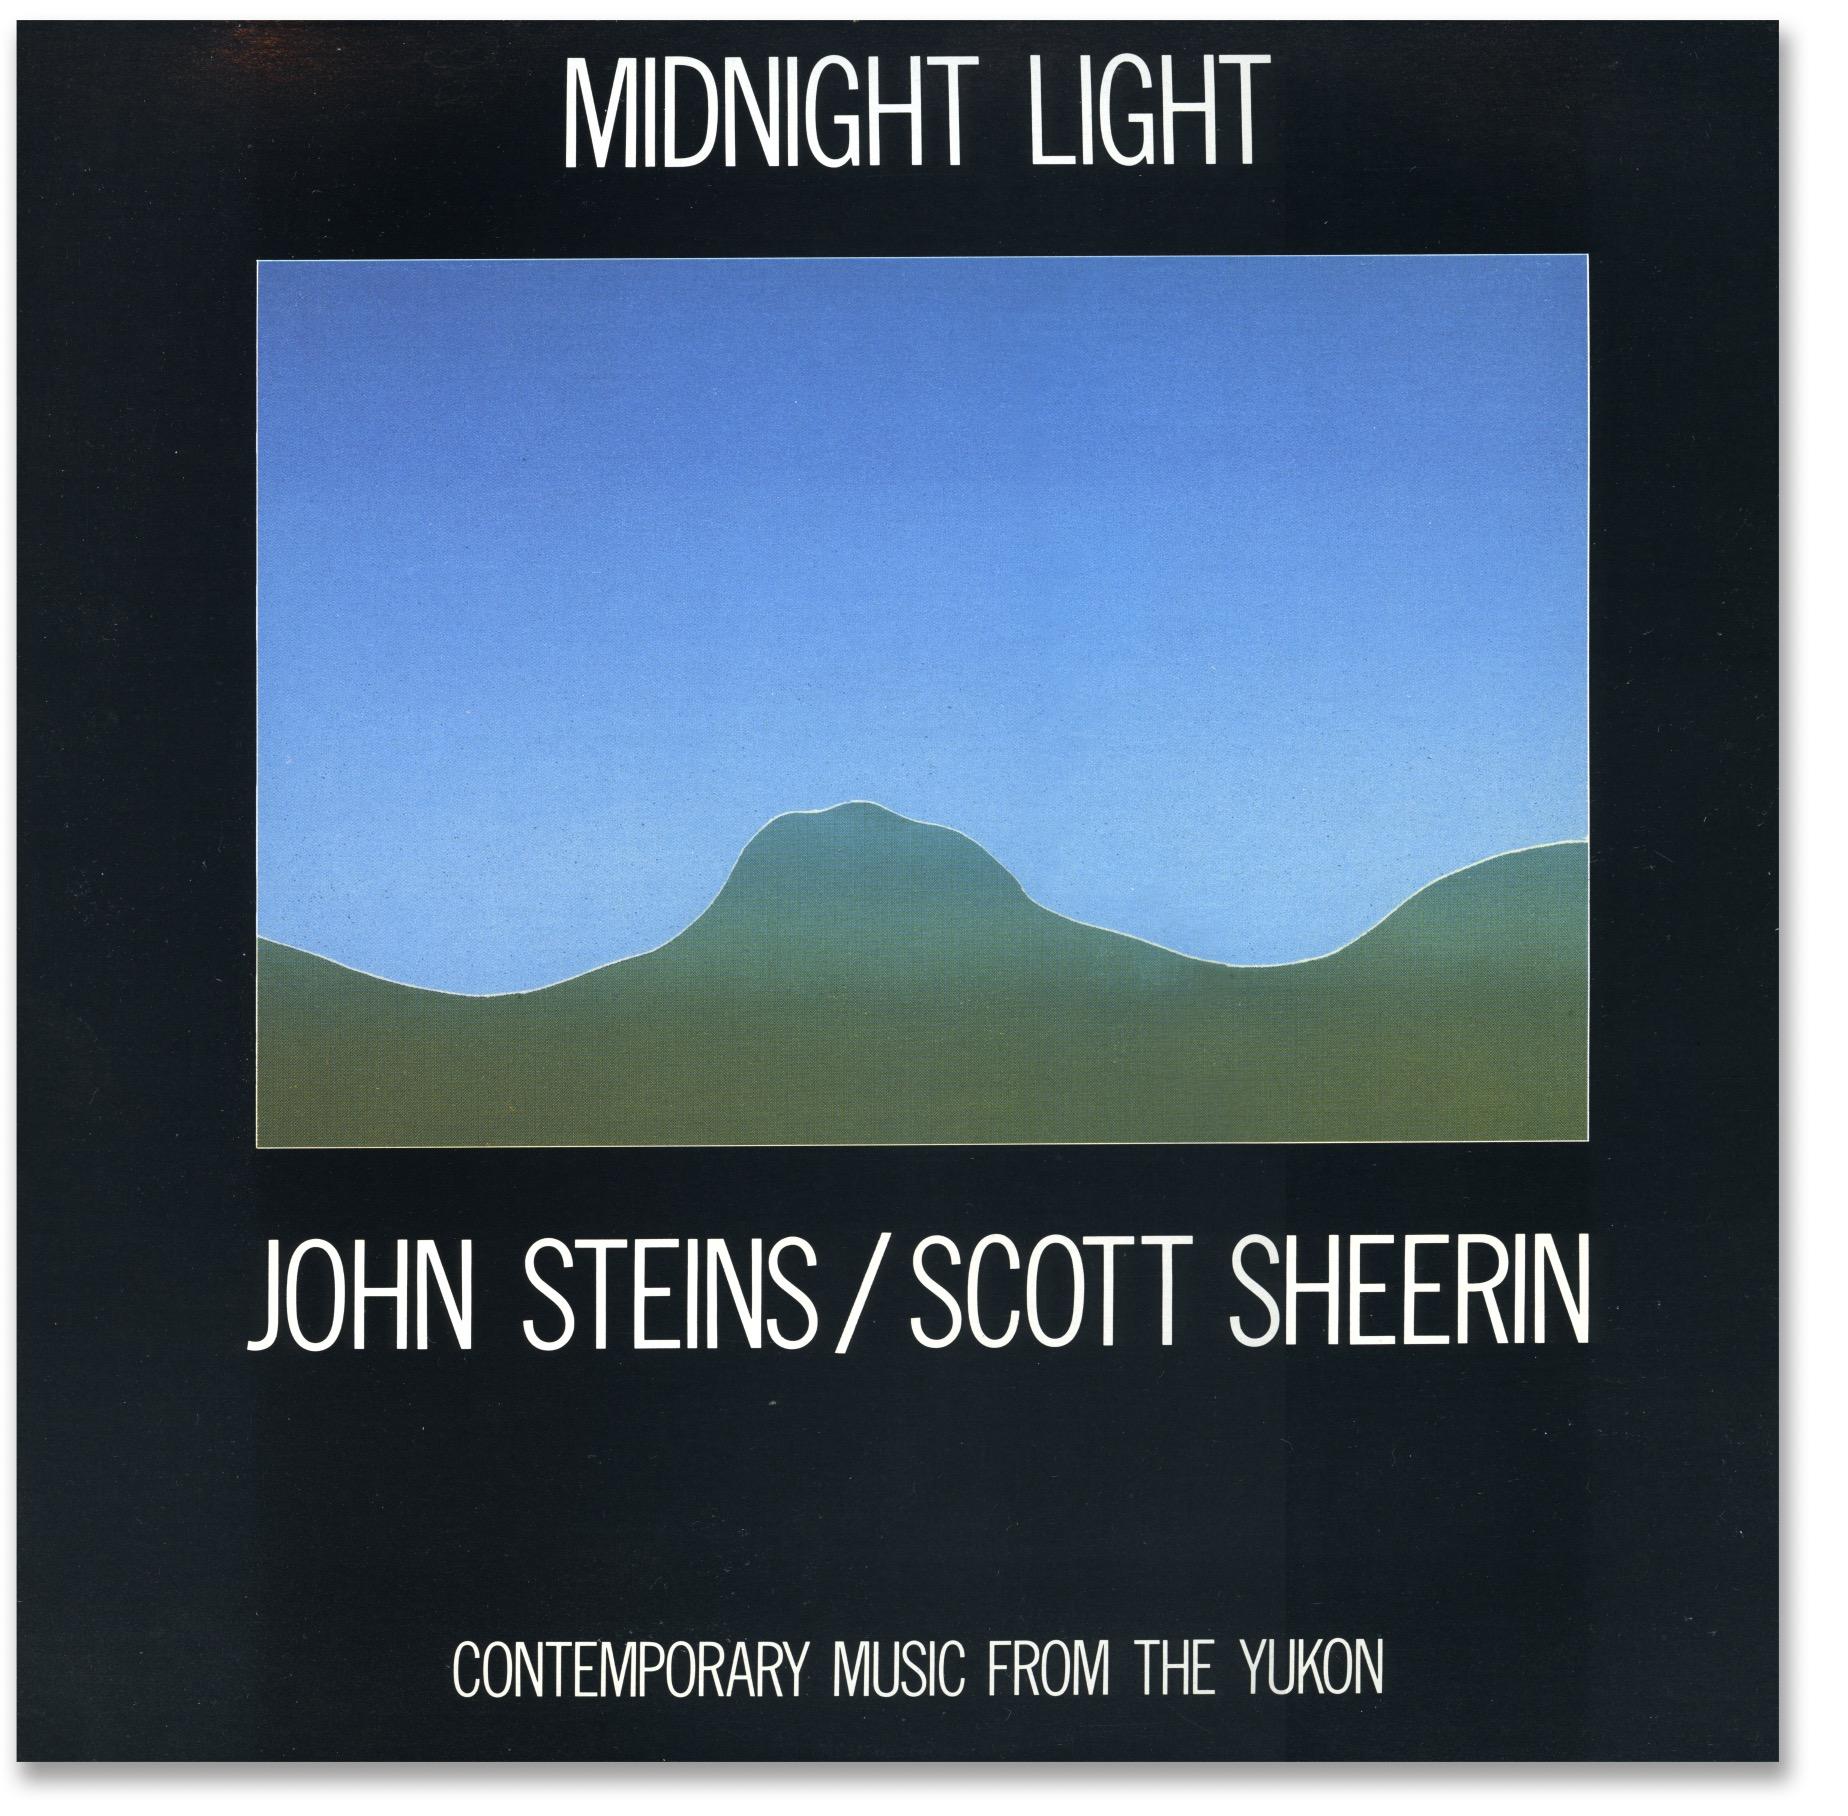 Midnight Light Cover